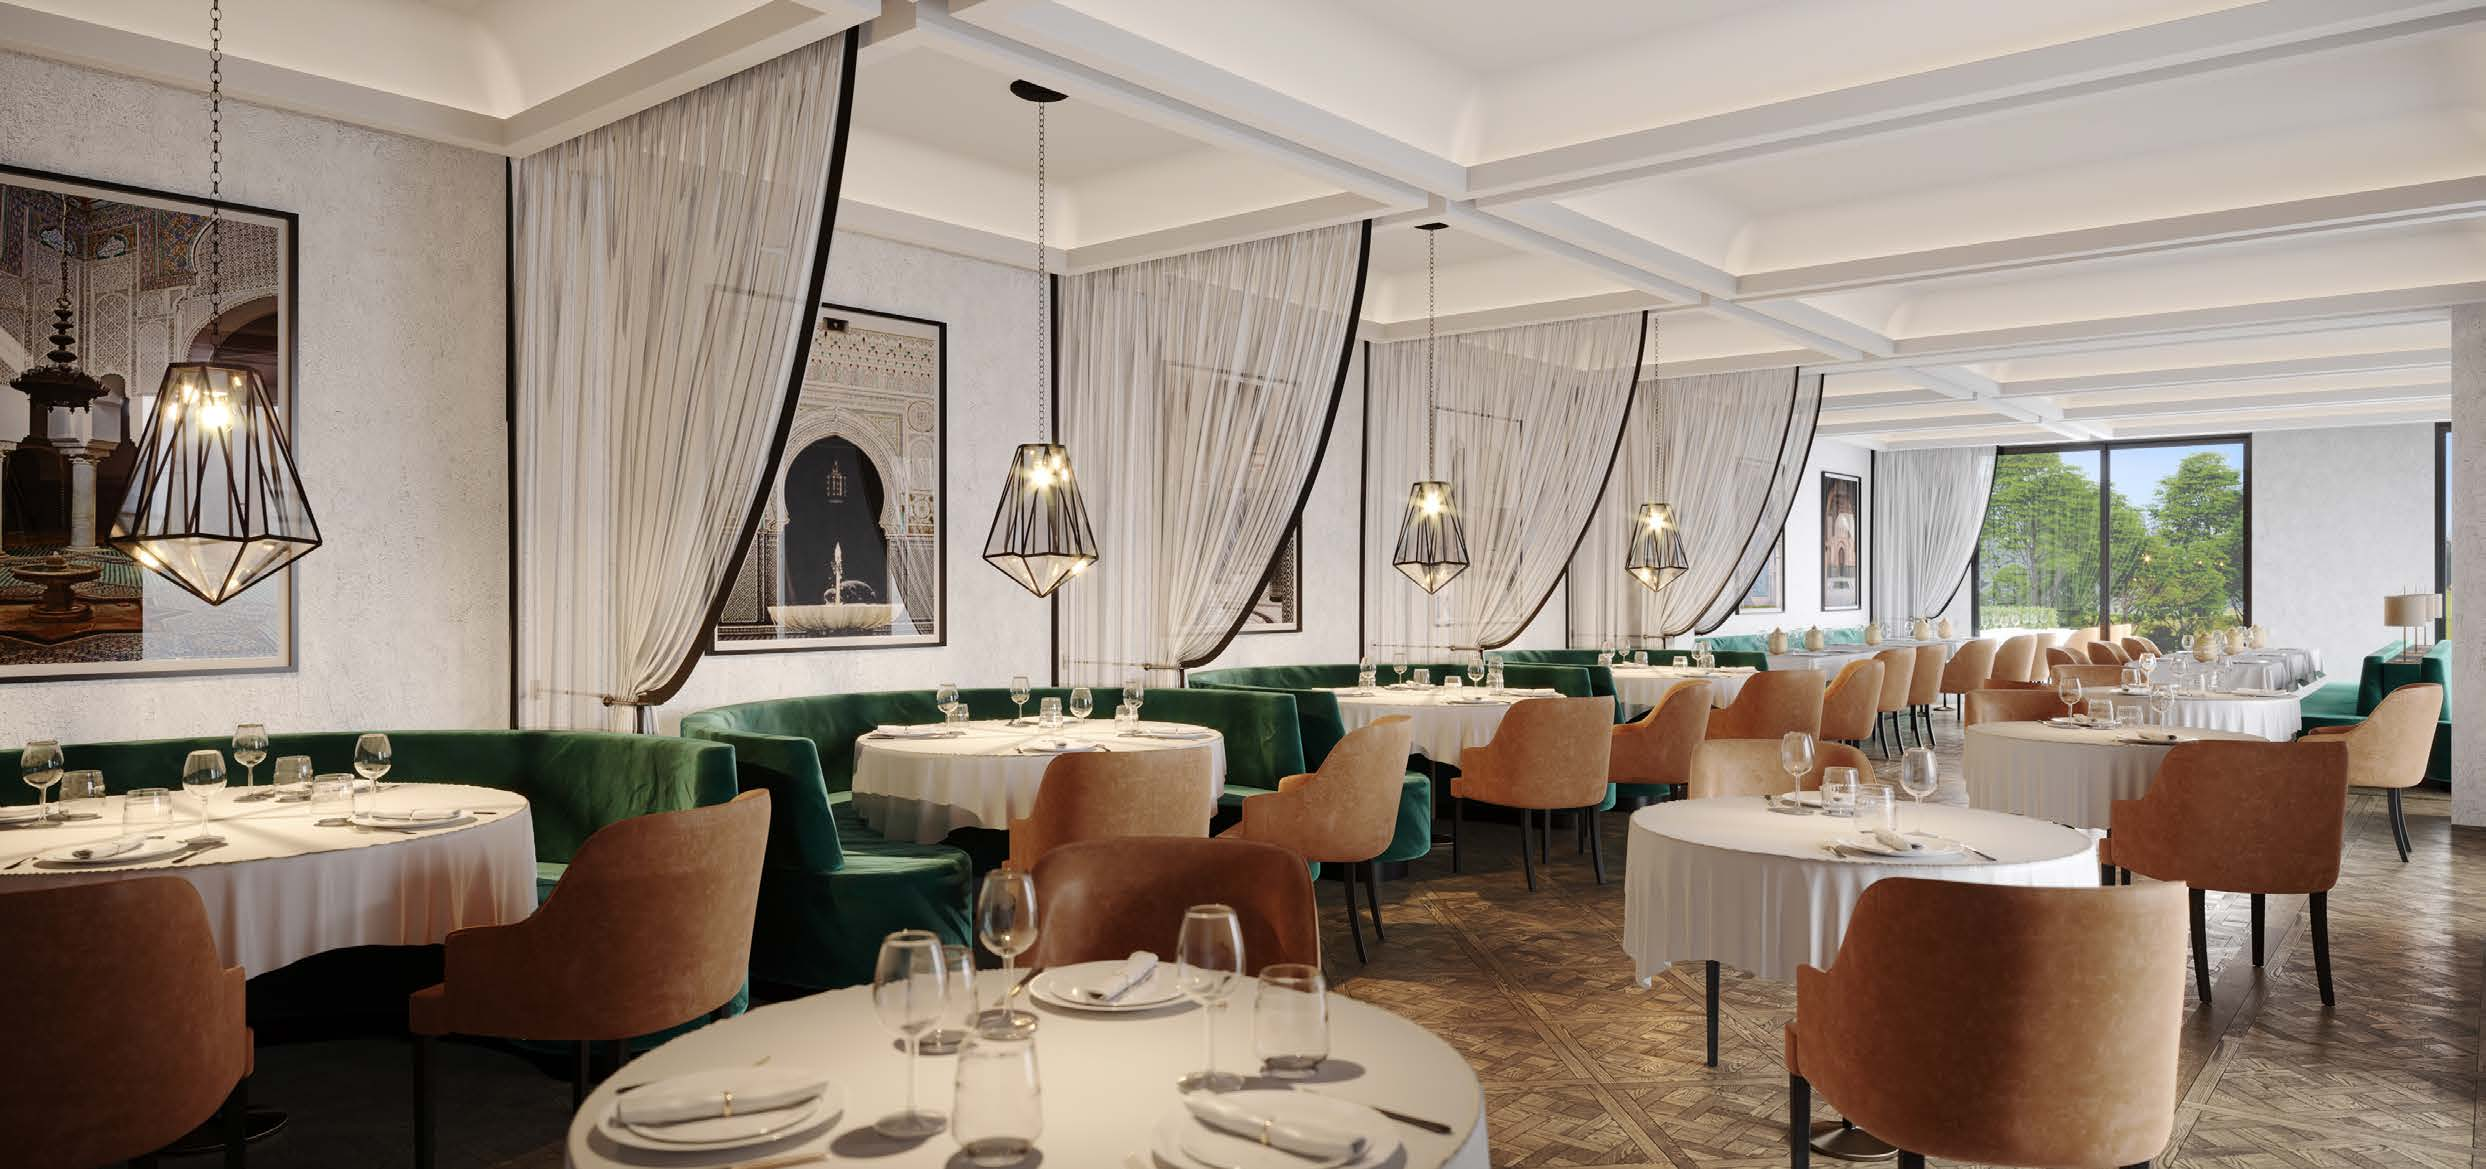 Story Rabat - Le Safran restaurant